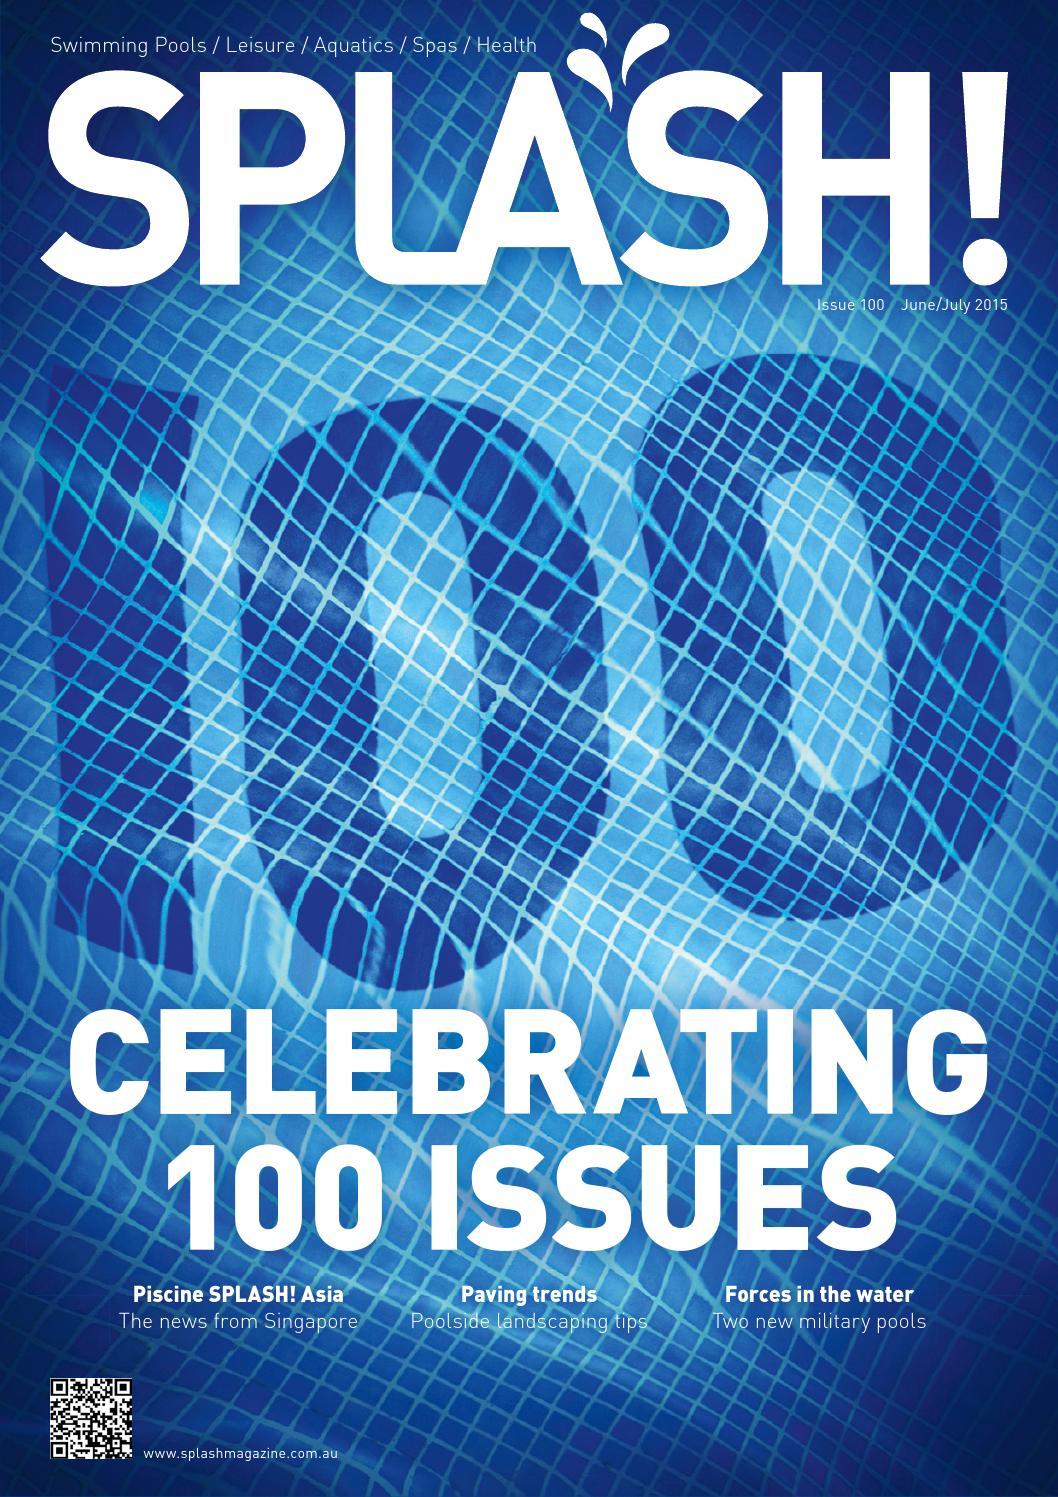 SPLASH Jun-Jul 2015 Issue - 100 by The Intermedia Group - issuu